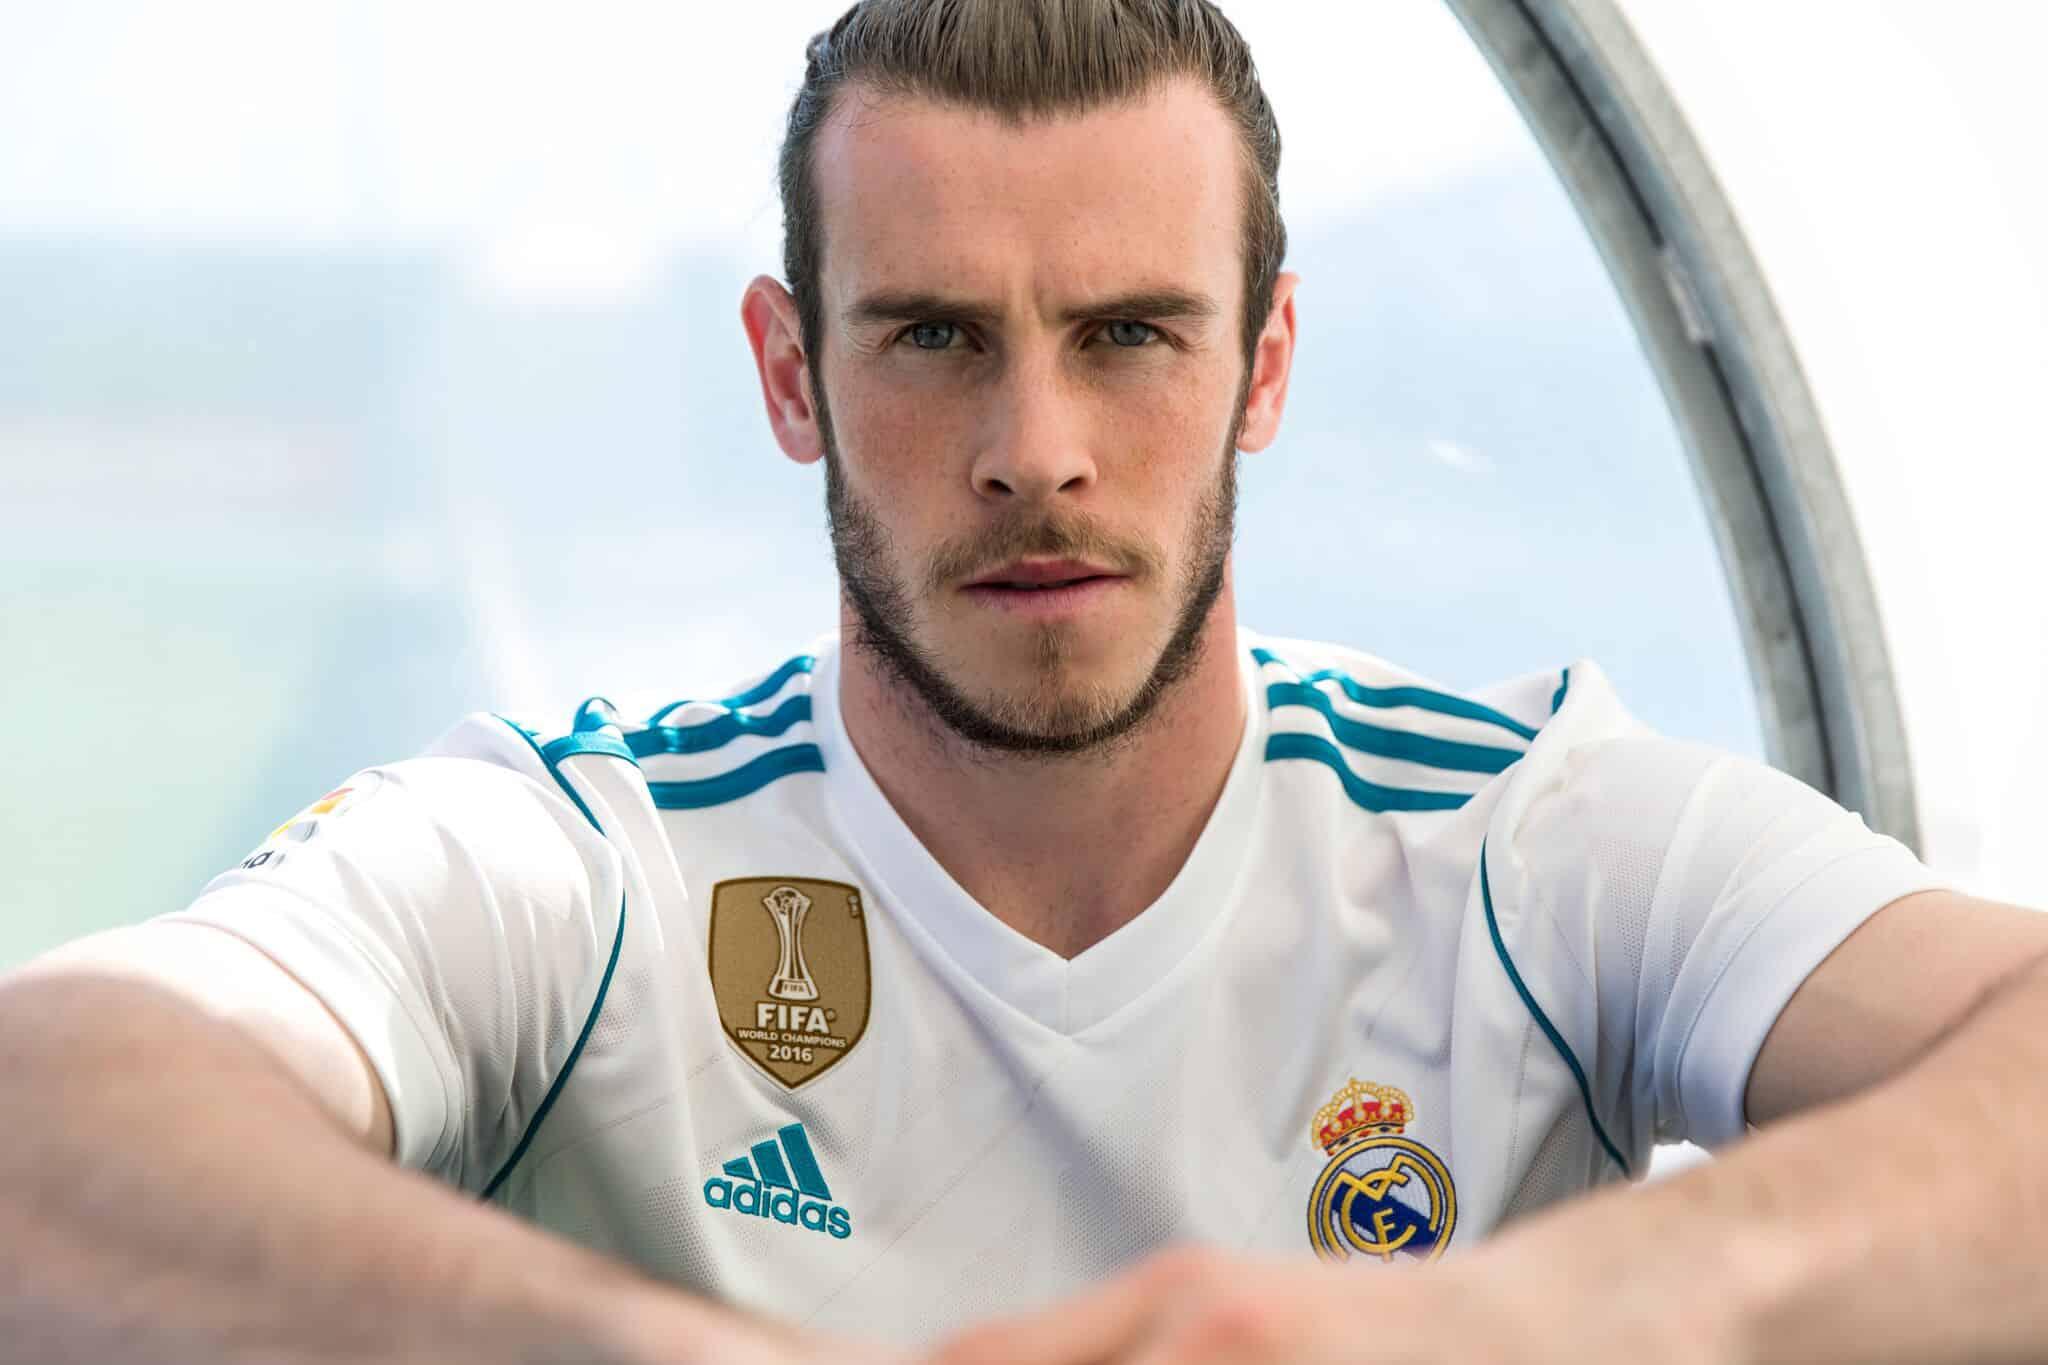 Maillot Domicile Real Madrid prix